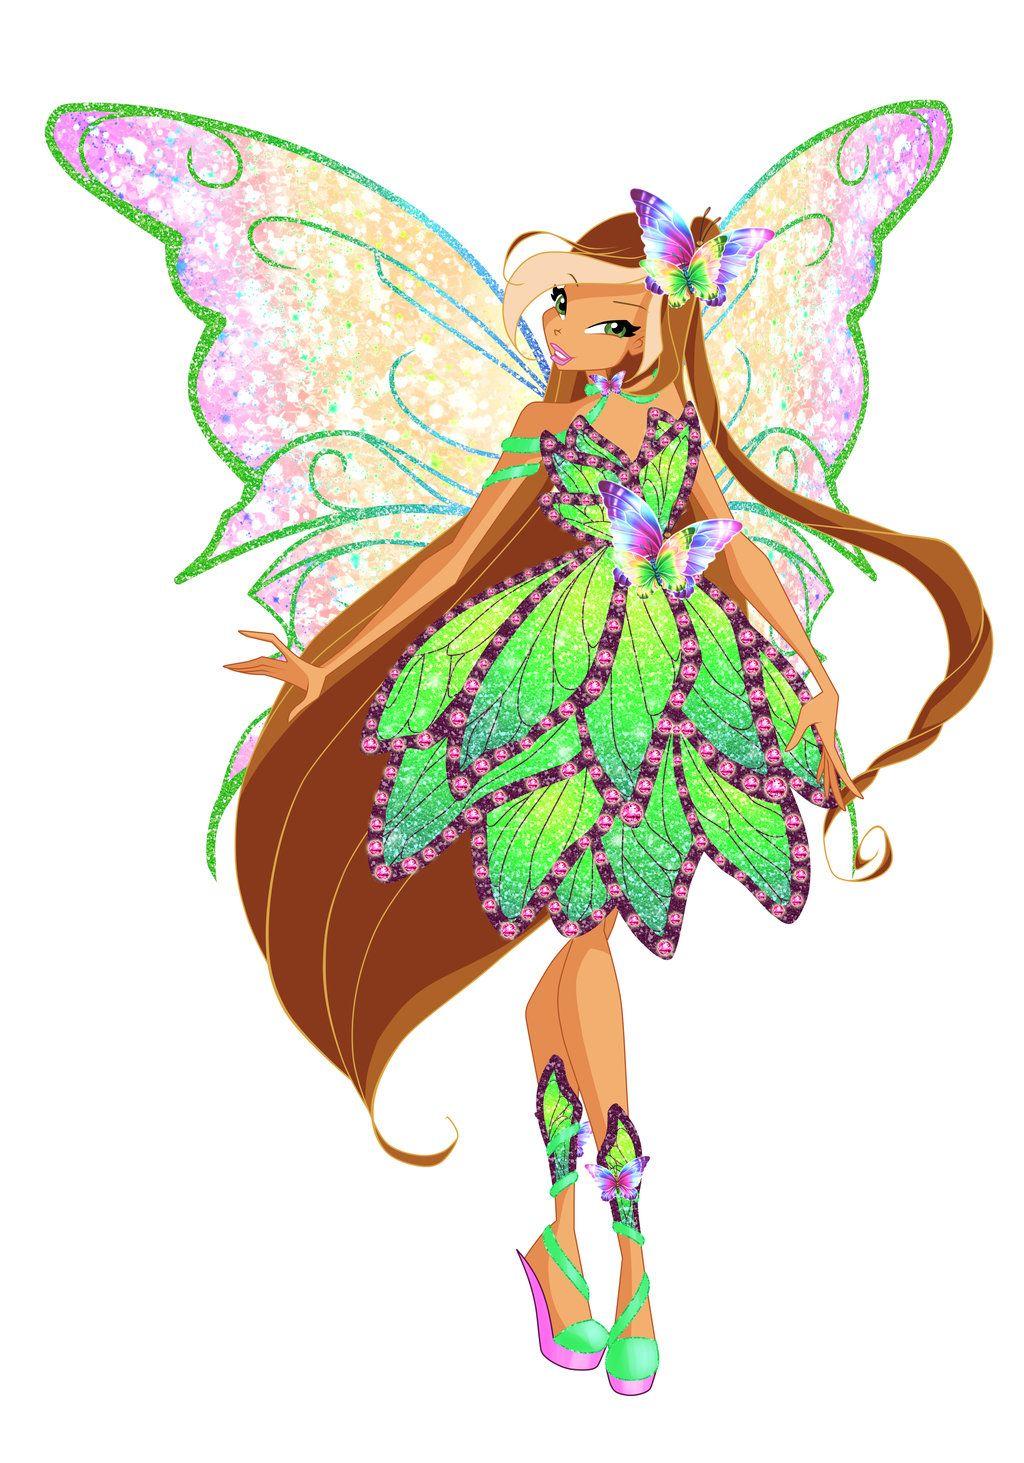 Deviantart coloring clubs - Deviantart Coloring Clubs Winx Butterflyix Flora By Bloom2 Deviantart Com On Deviantart